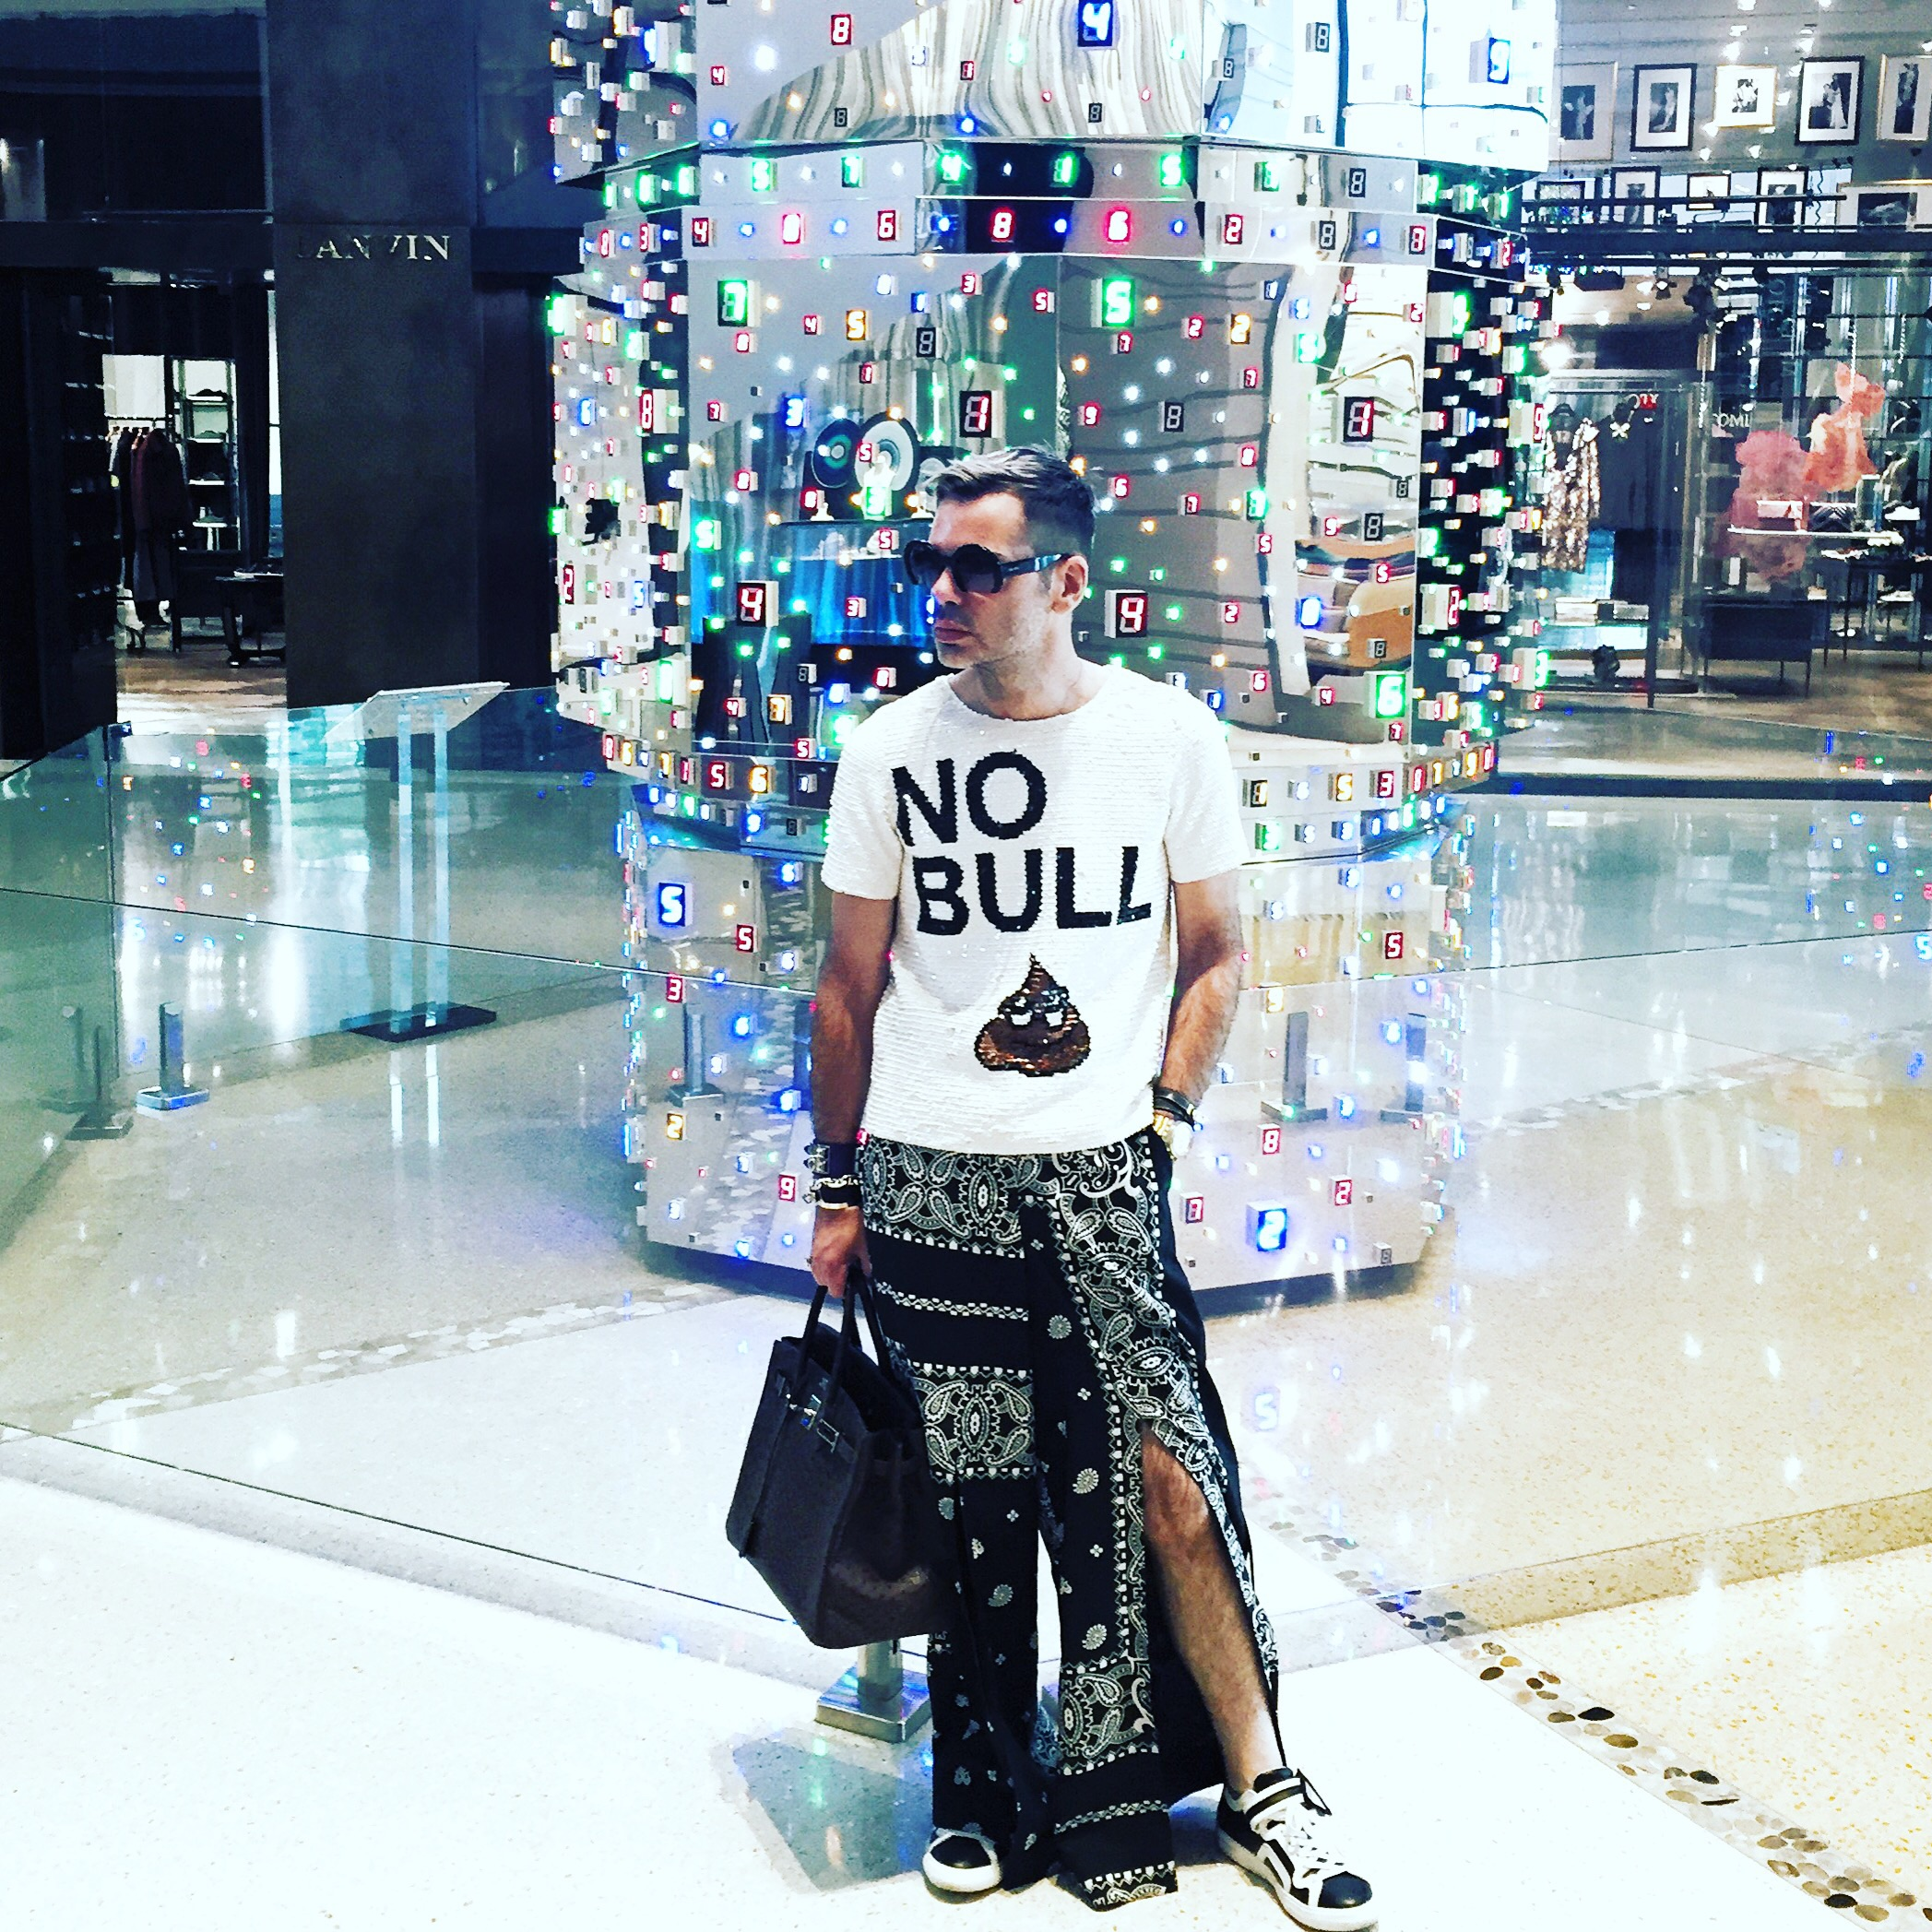 No Bull 💩